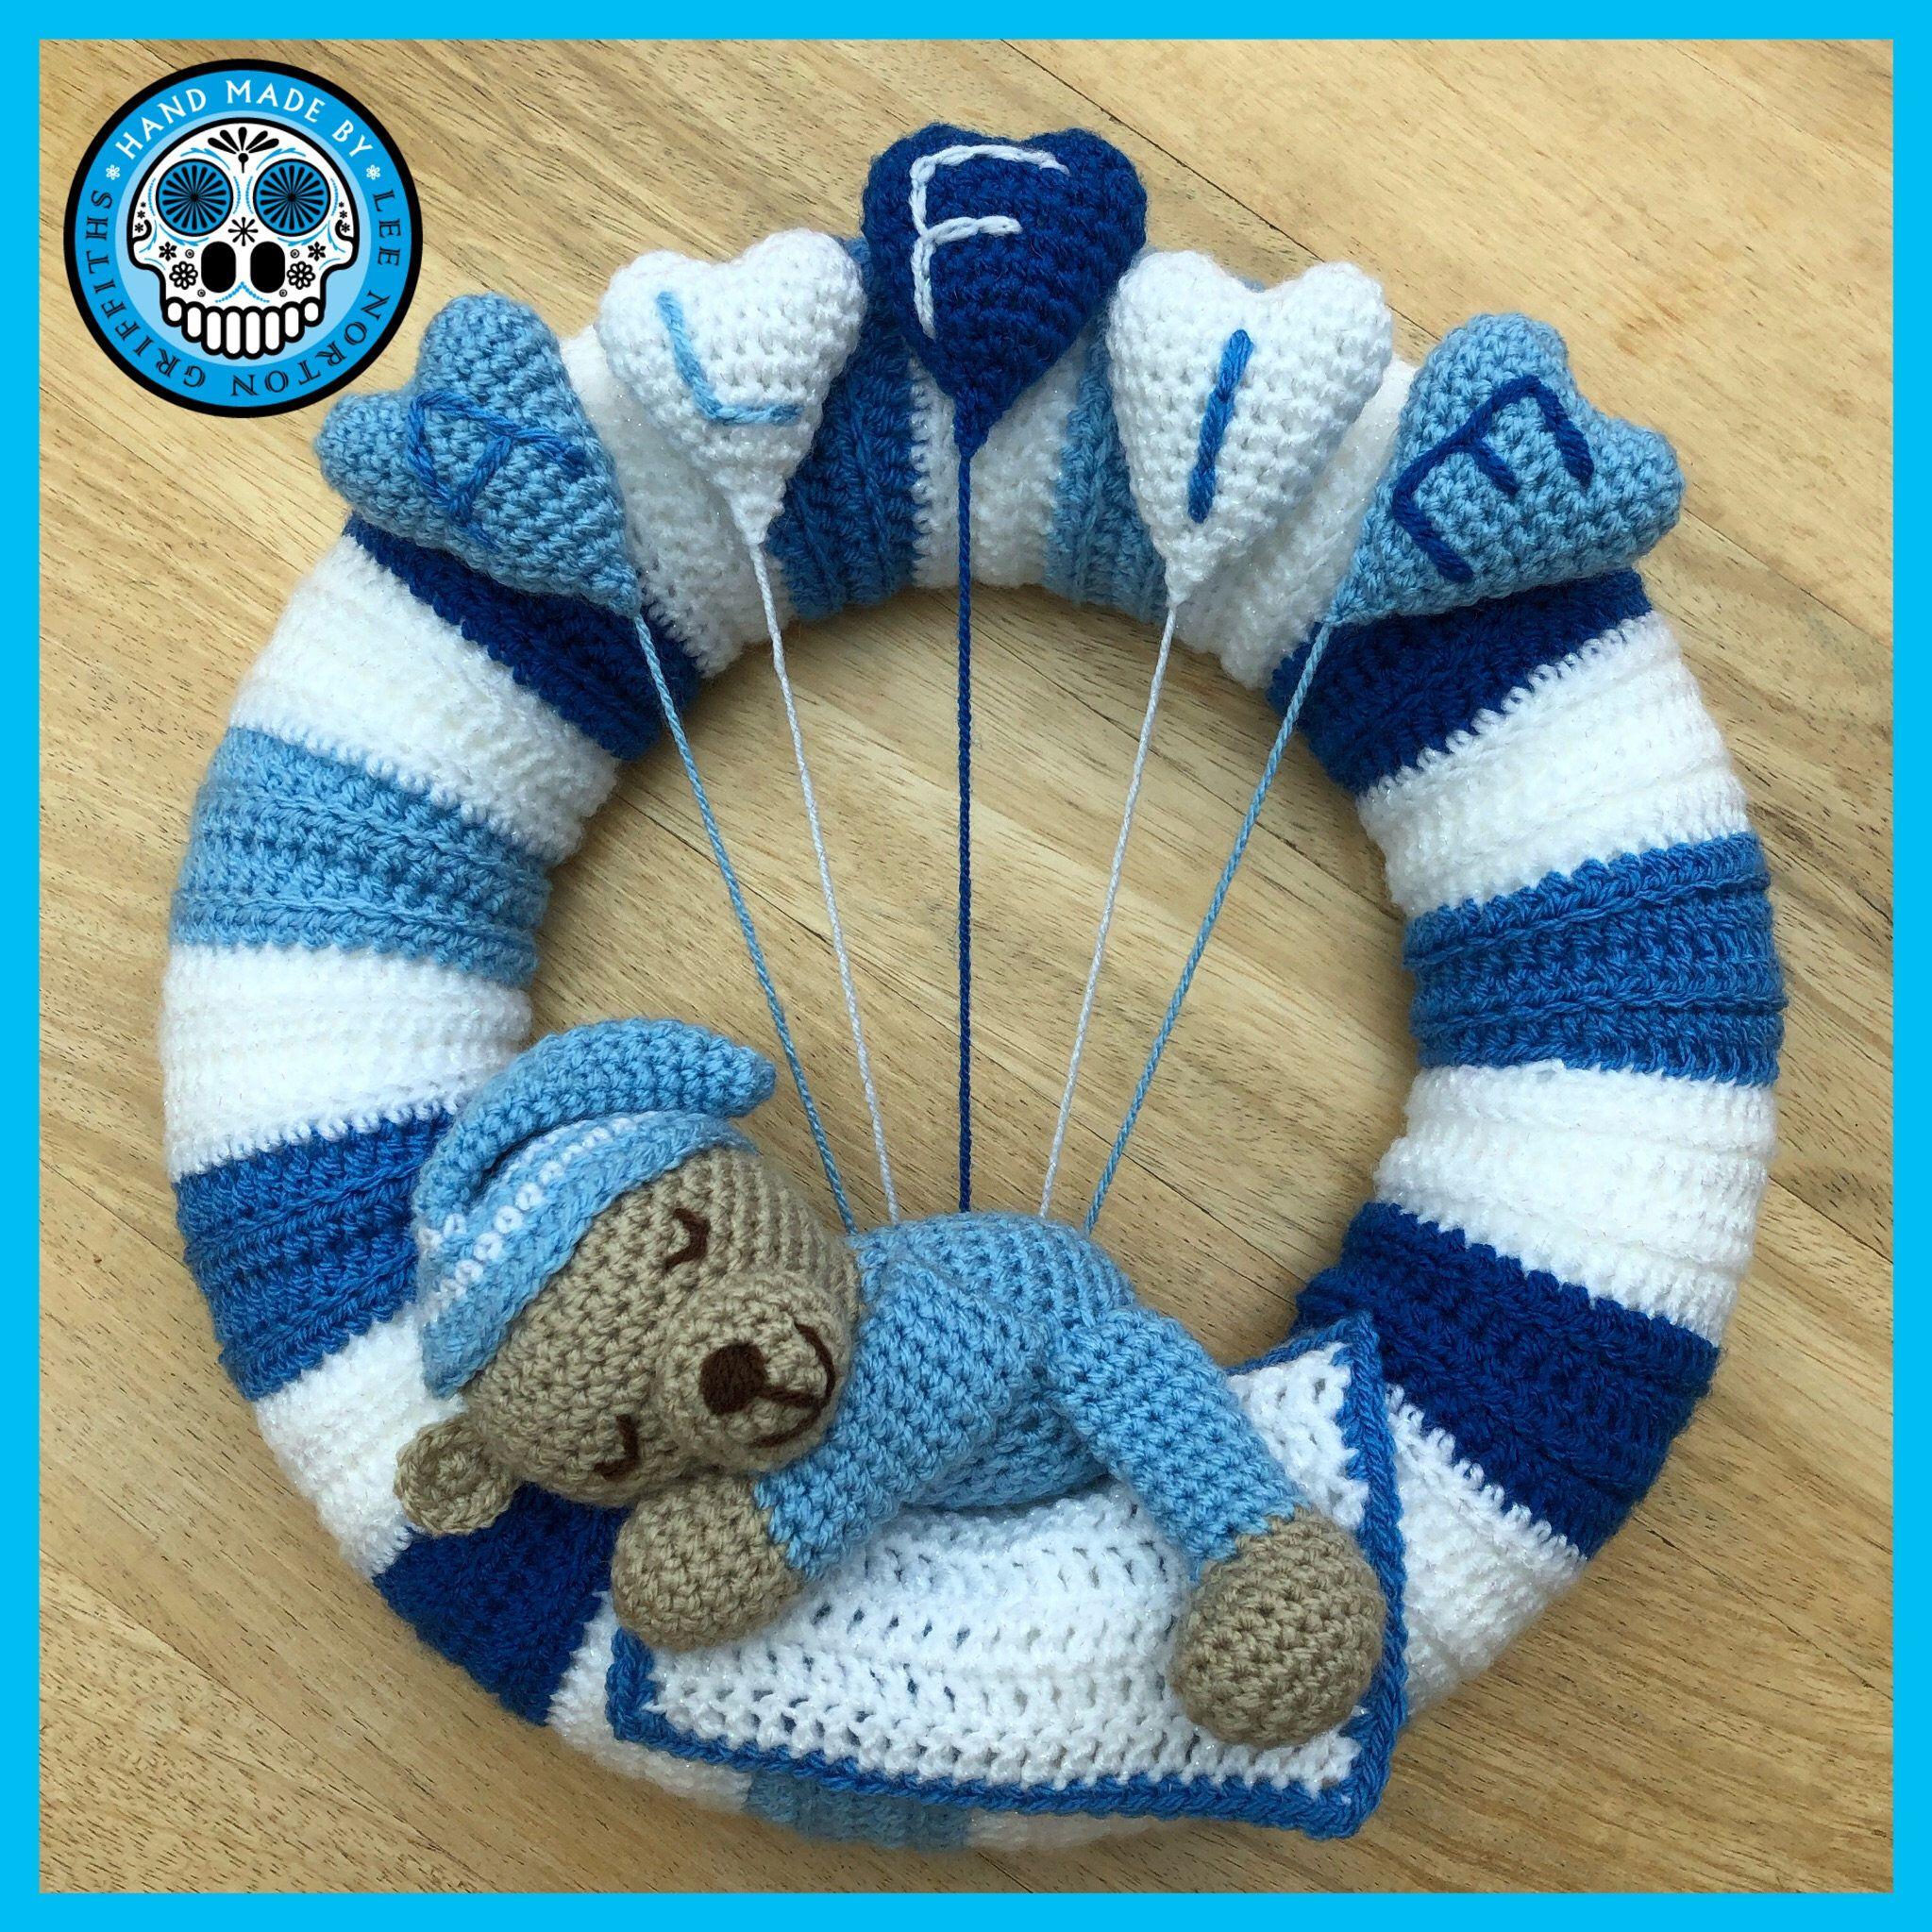 Photo of Crochet Baby Shower wreath pattern, Crochet baby shower gift pattern, Crochet Christening gift pattern, amigurumi baby shower pattern